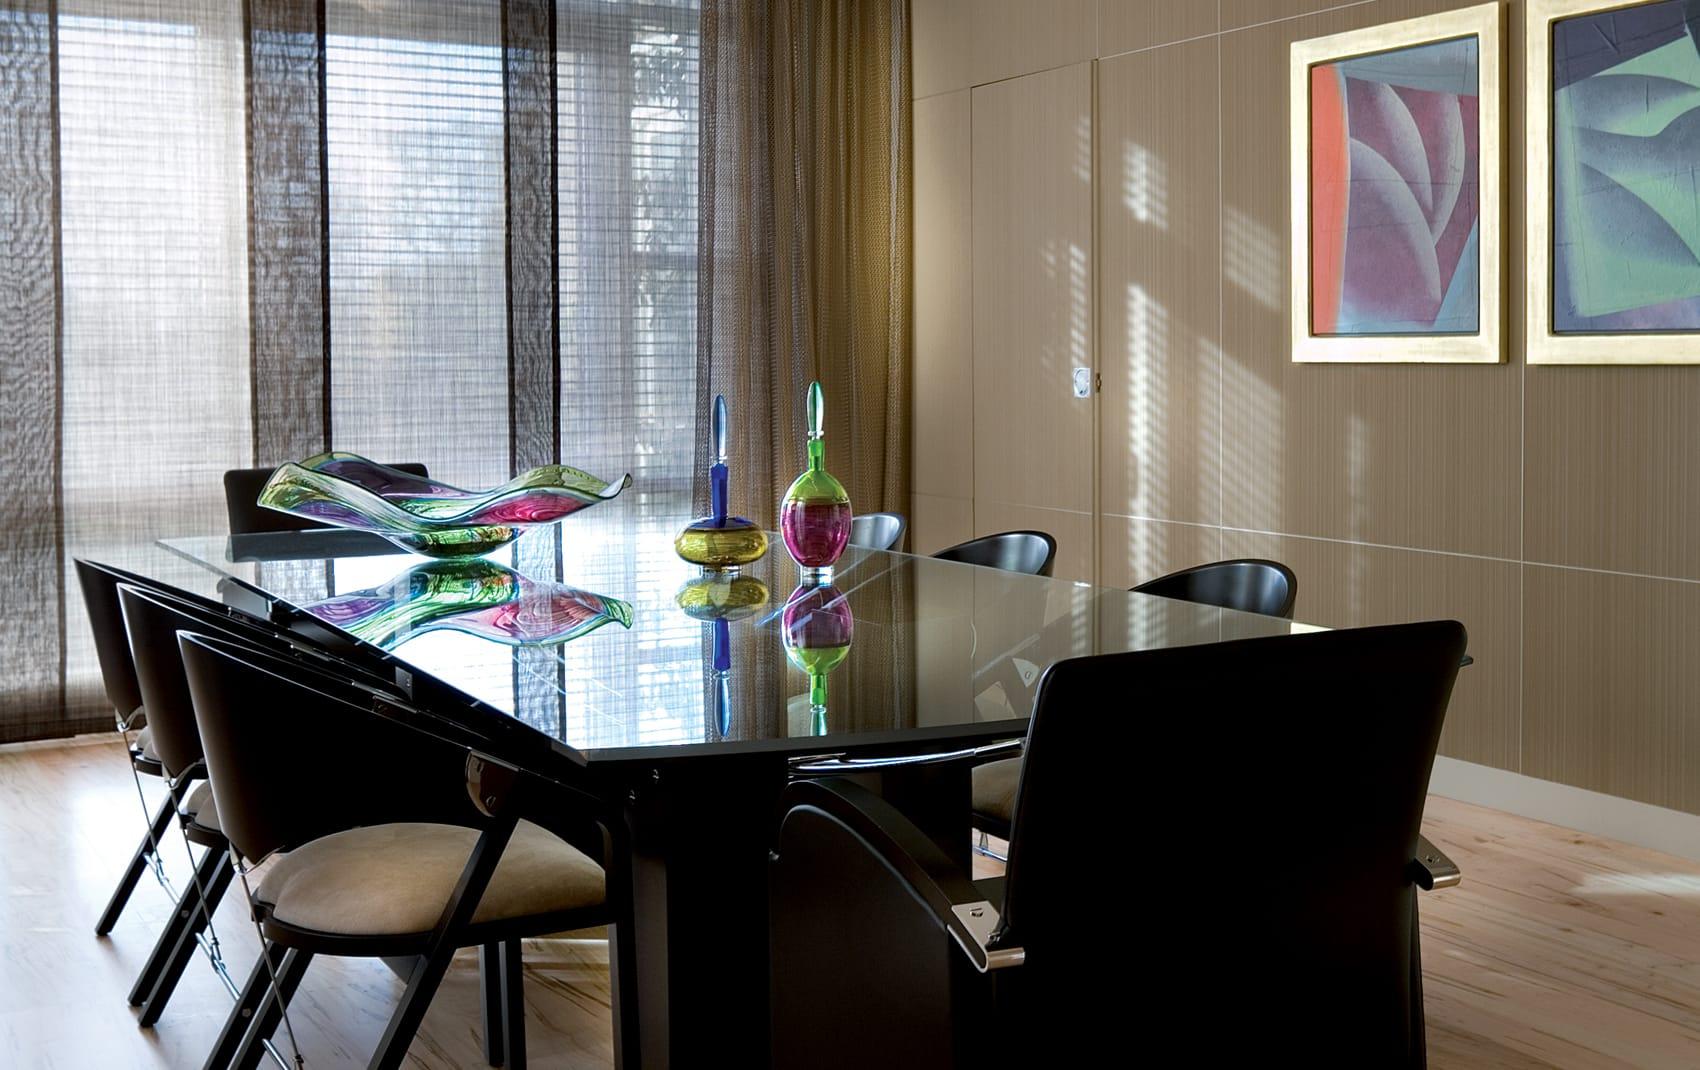 luxury interior dining room table